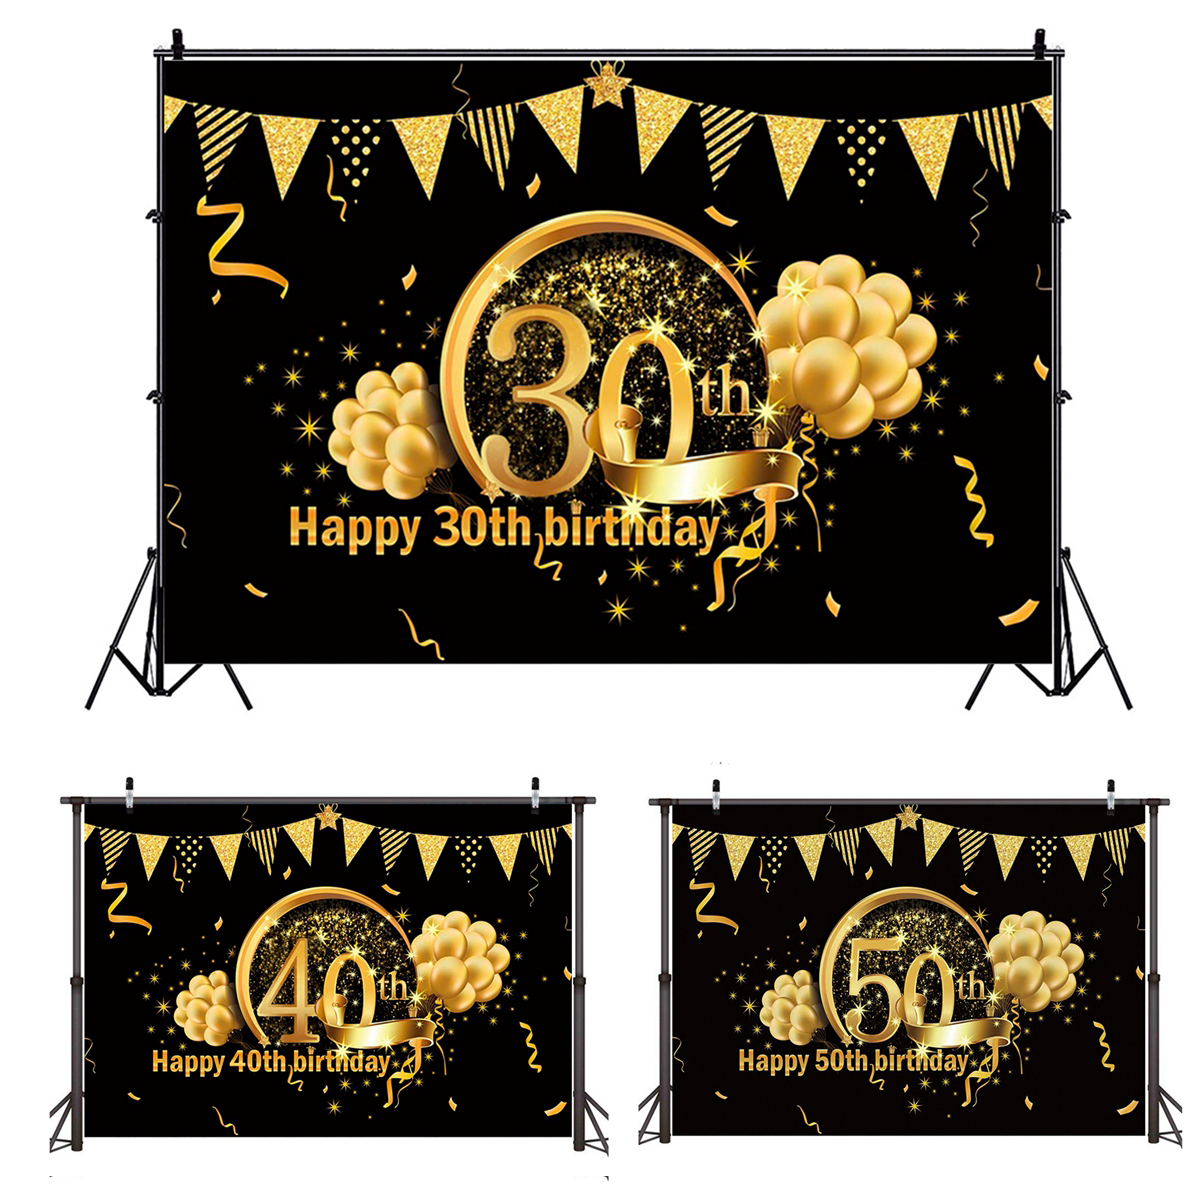 QIFU Birthday Background Decor 30 40 50 Birthday Party Decor Adult 30th 40th 50th Birthday Party Supplies 30 Years Anniversary